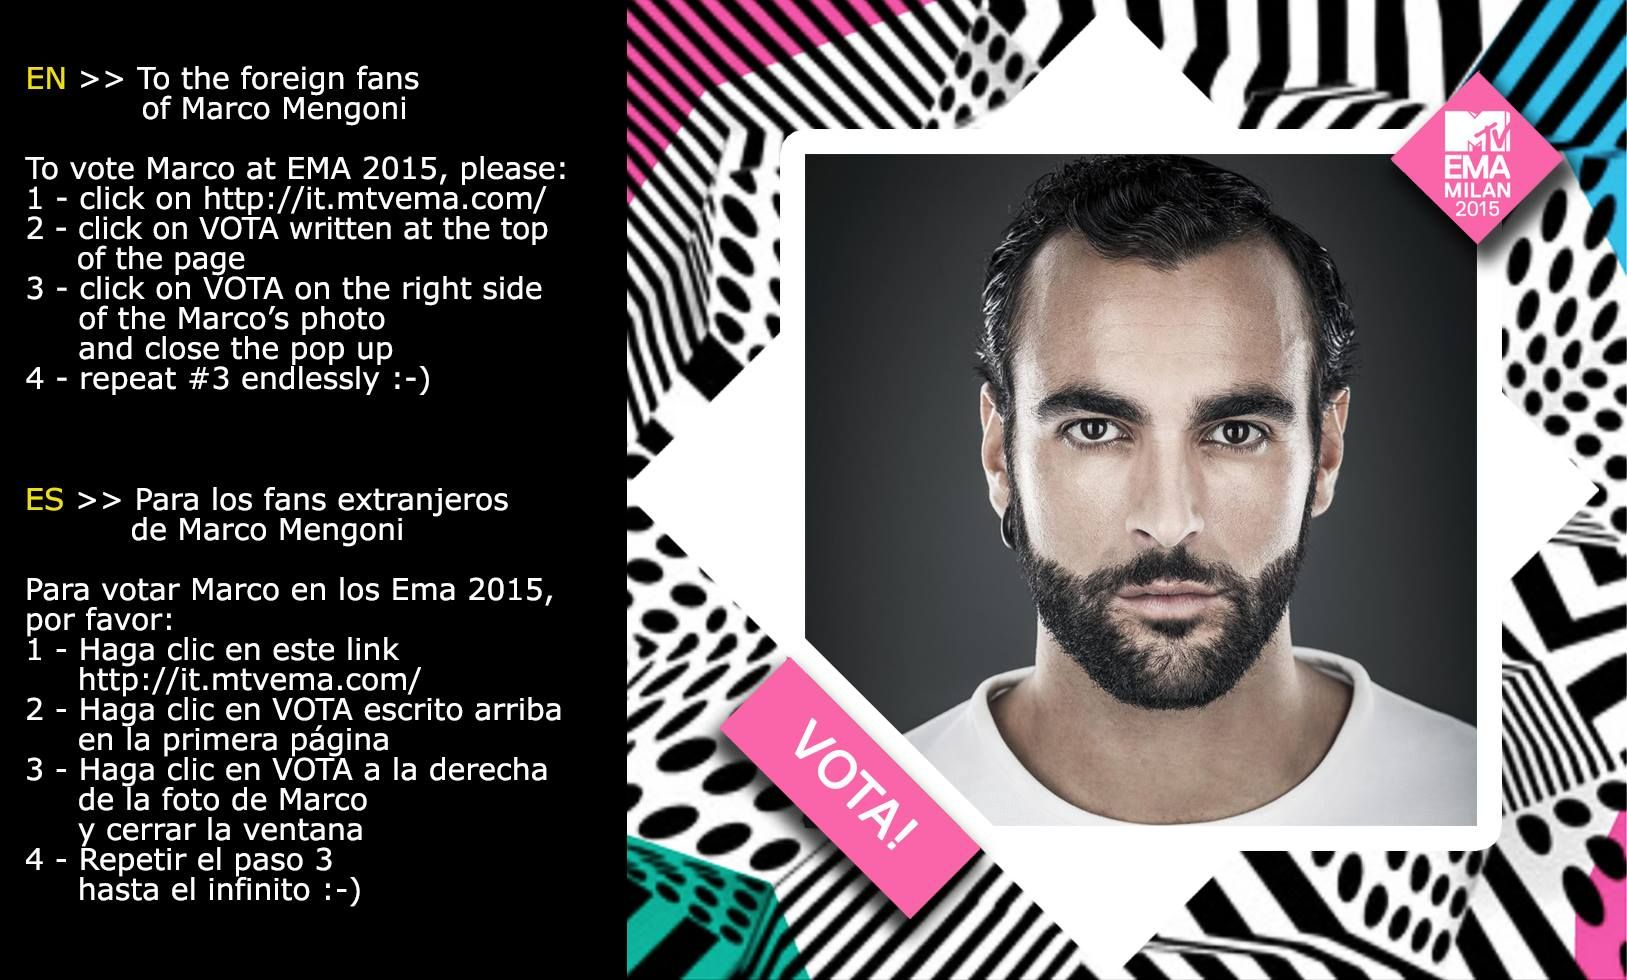 How to vote/Cómo votar For foreign fans of Marco Mengoni Para los fans extranjeros de Marco Mengoni